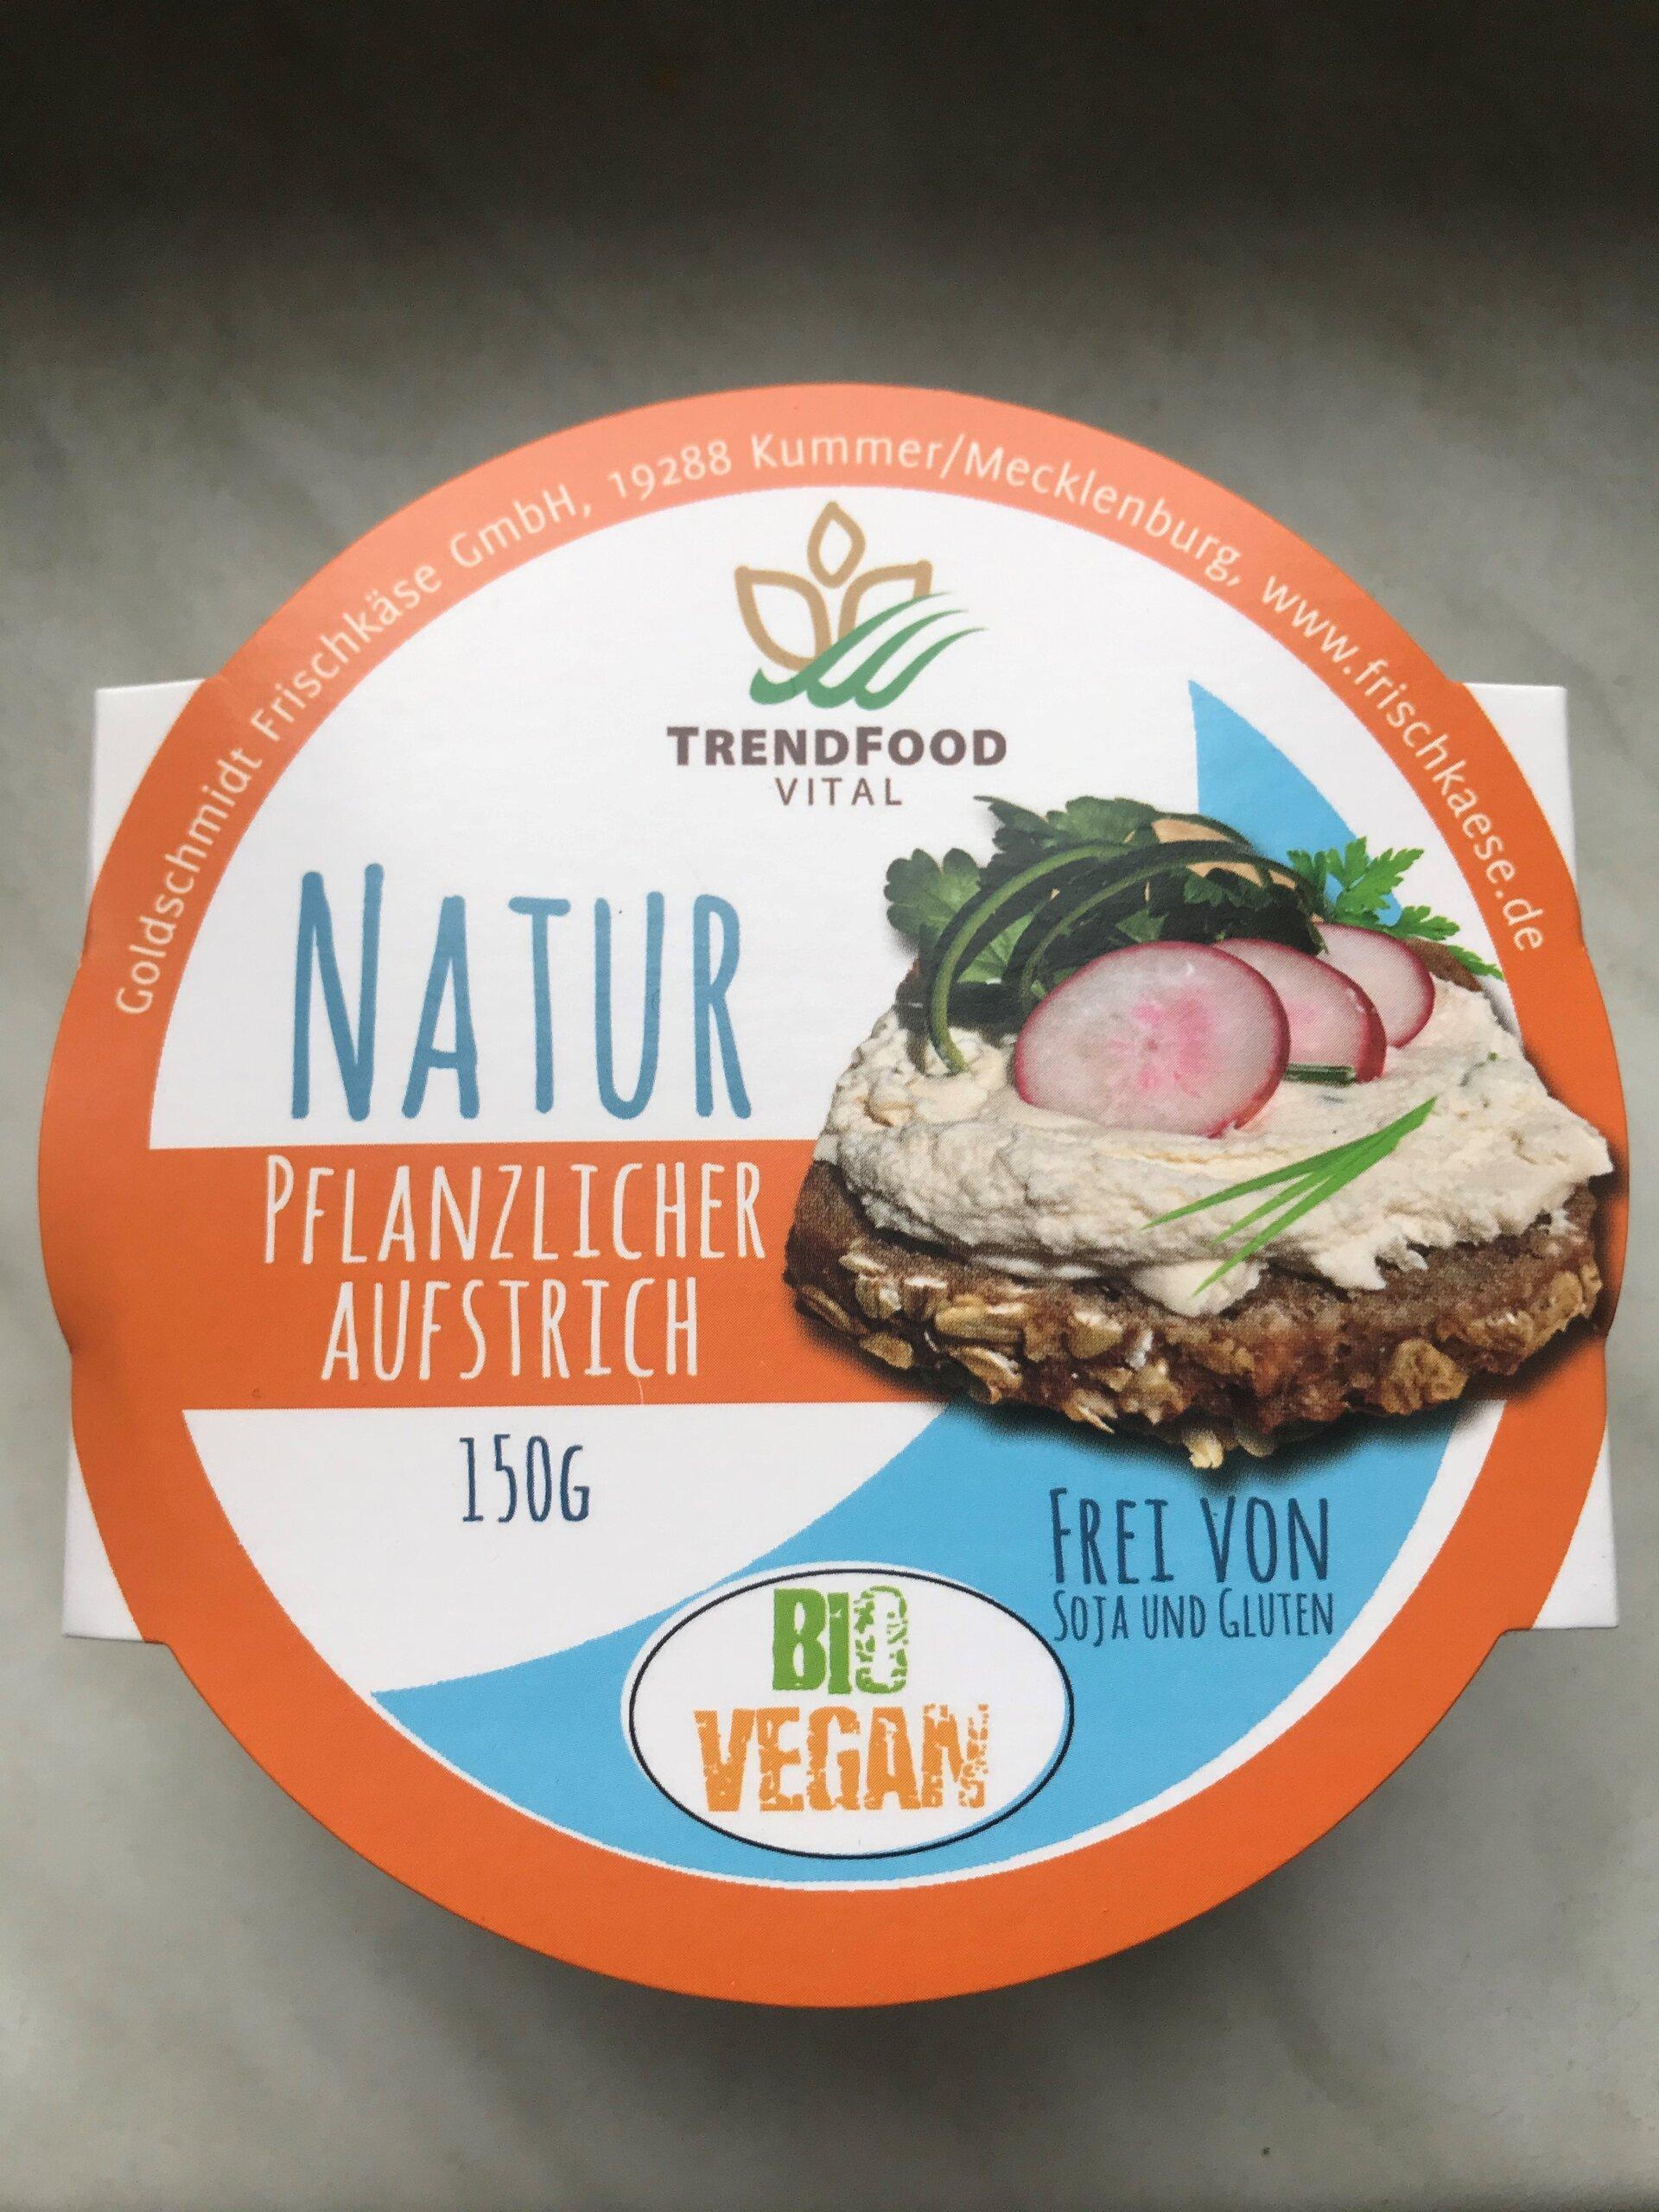 Vegan Frischkäse